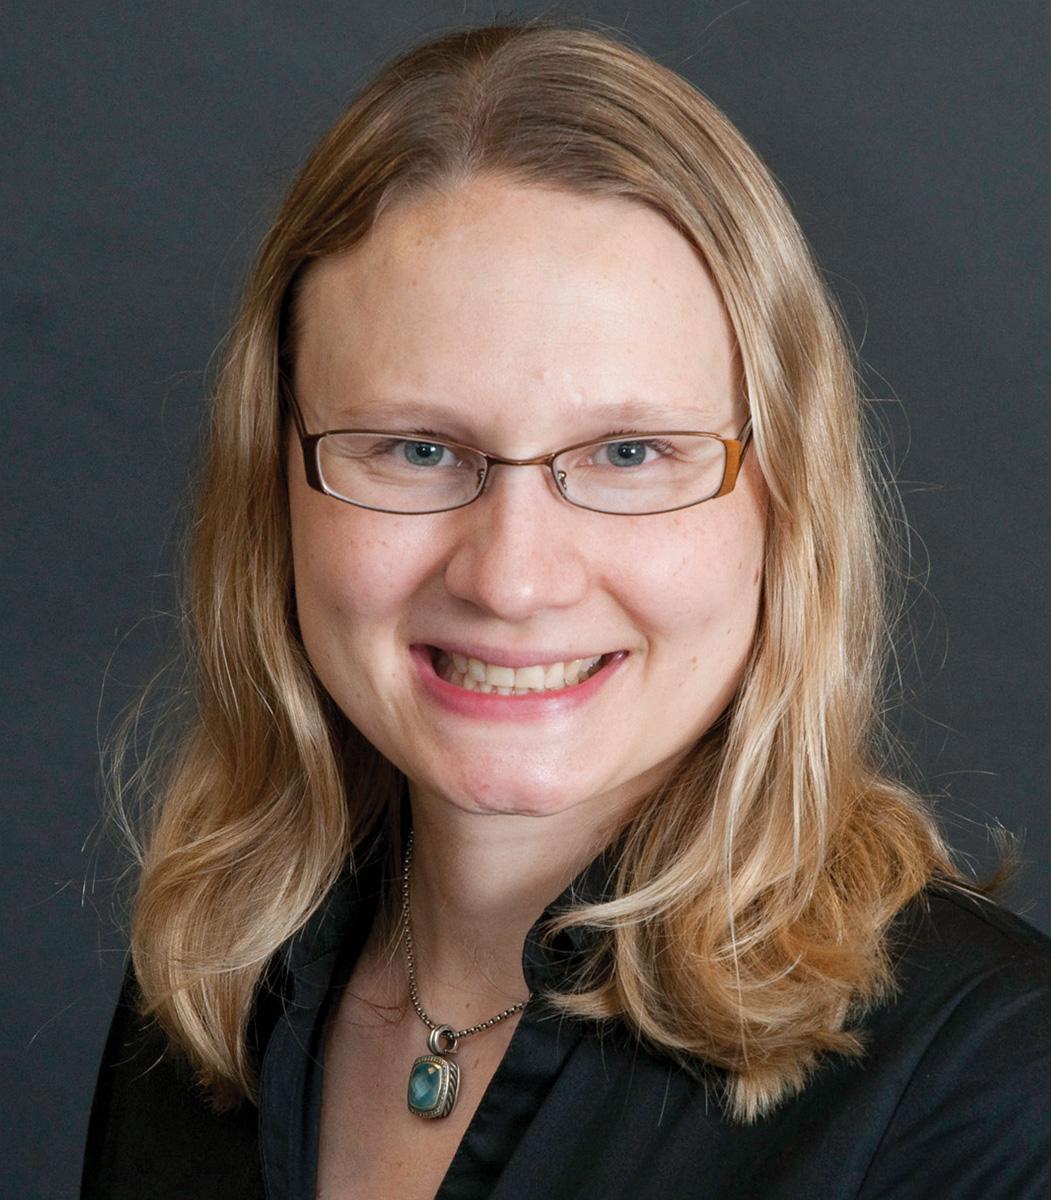 Forum on this topic: Sarah Schkeeper, melinda-ledbetter/